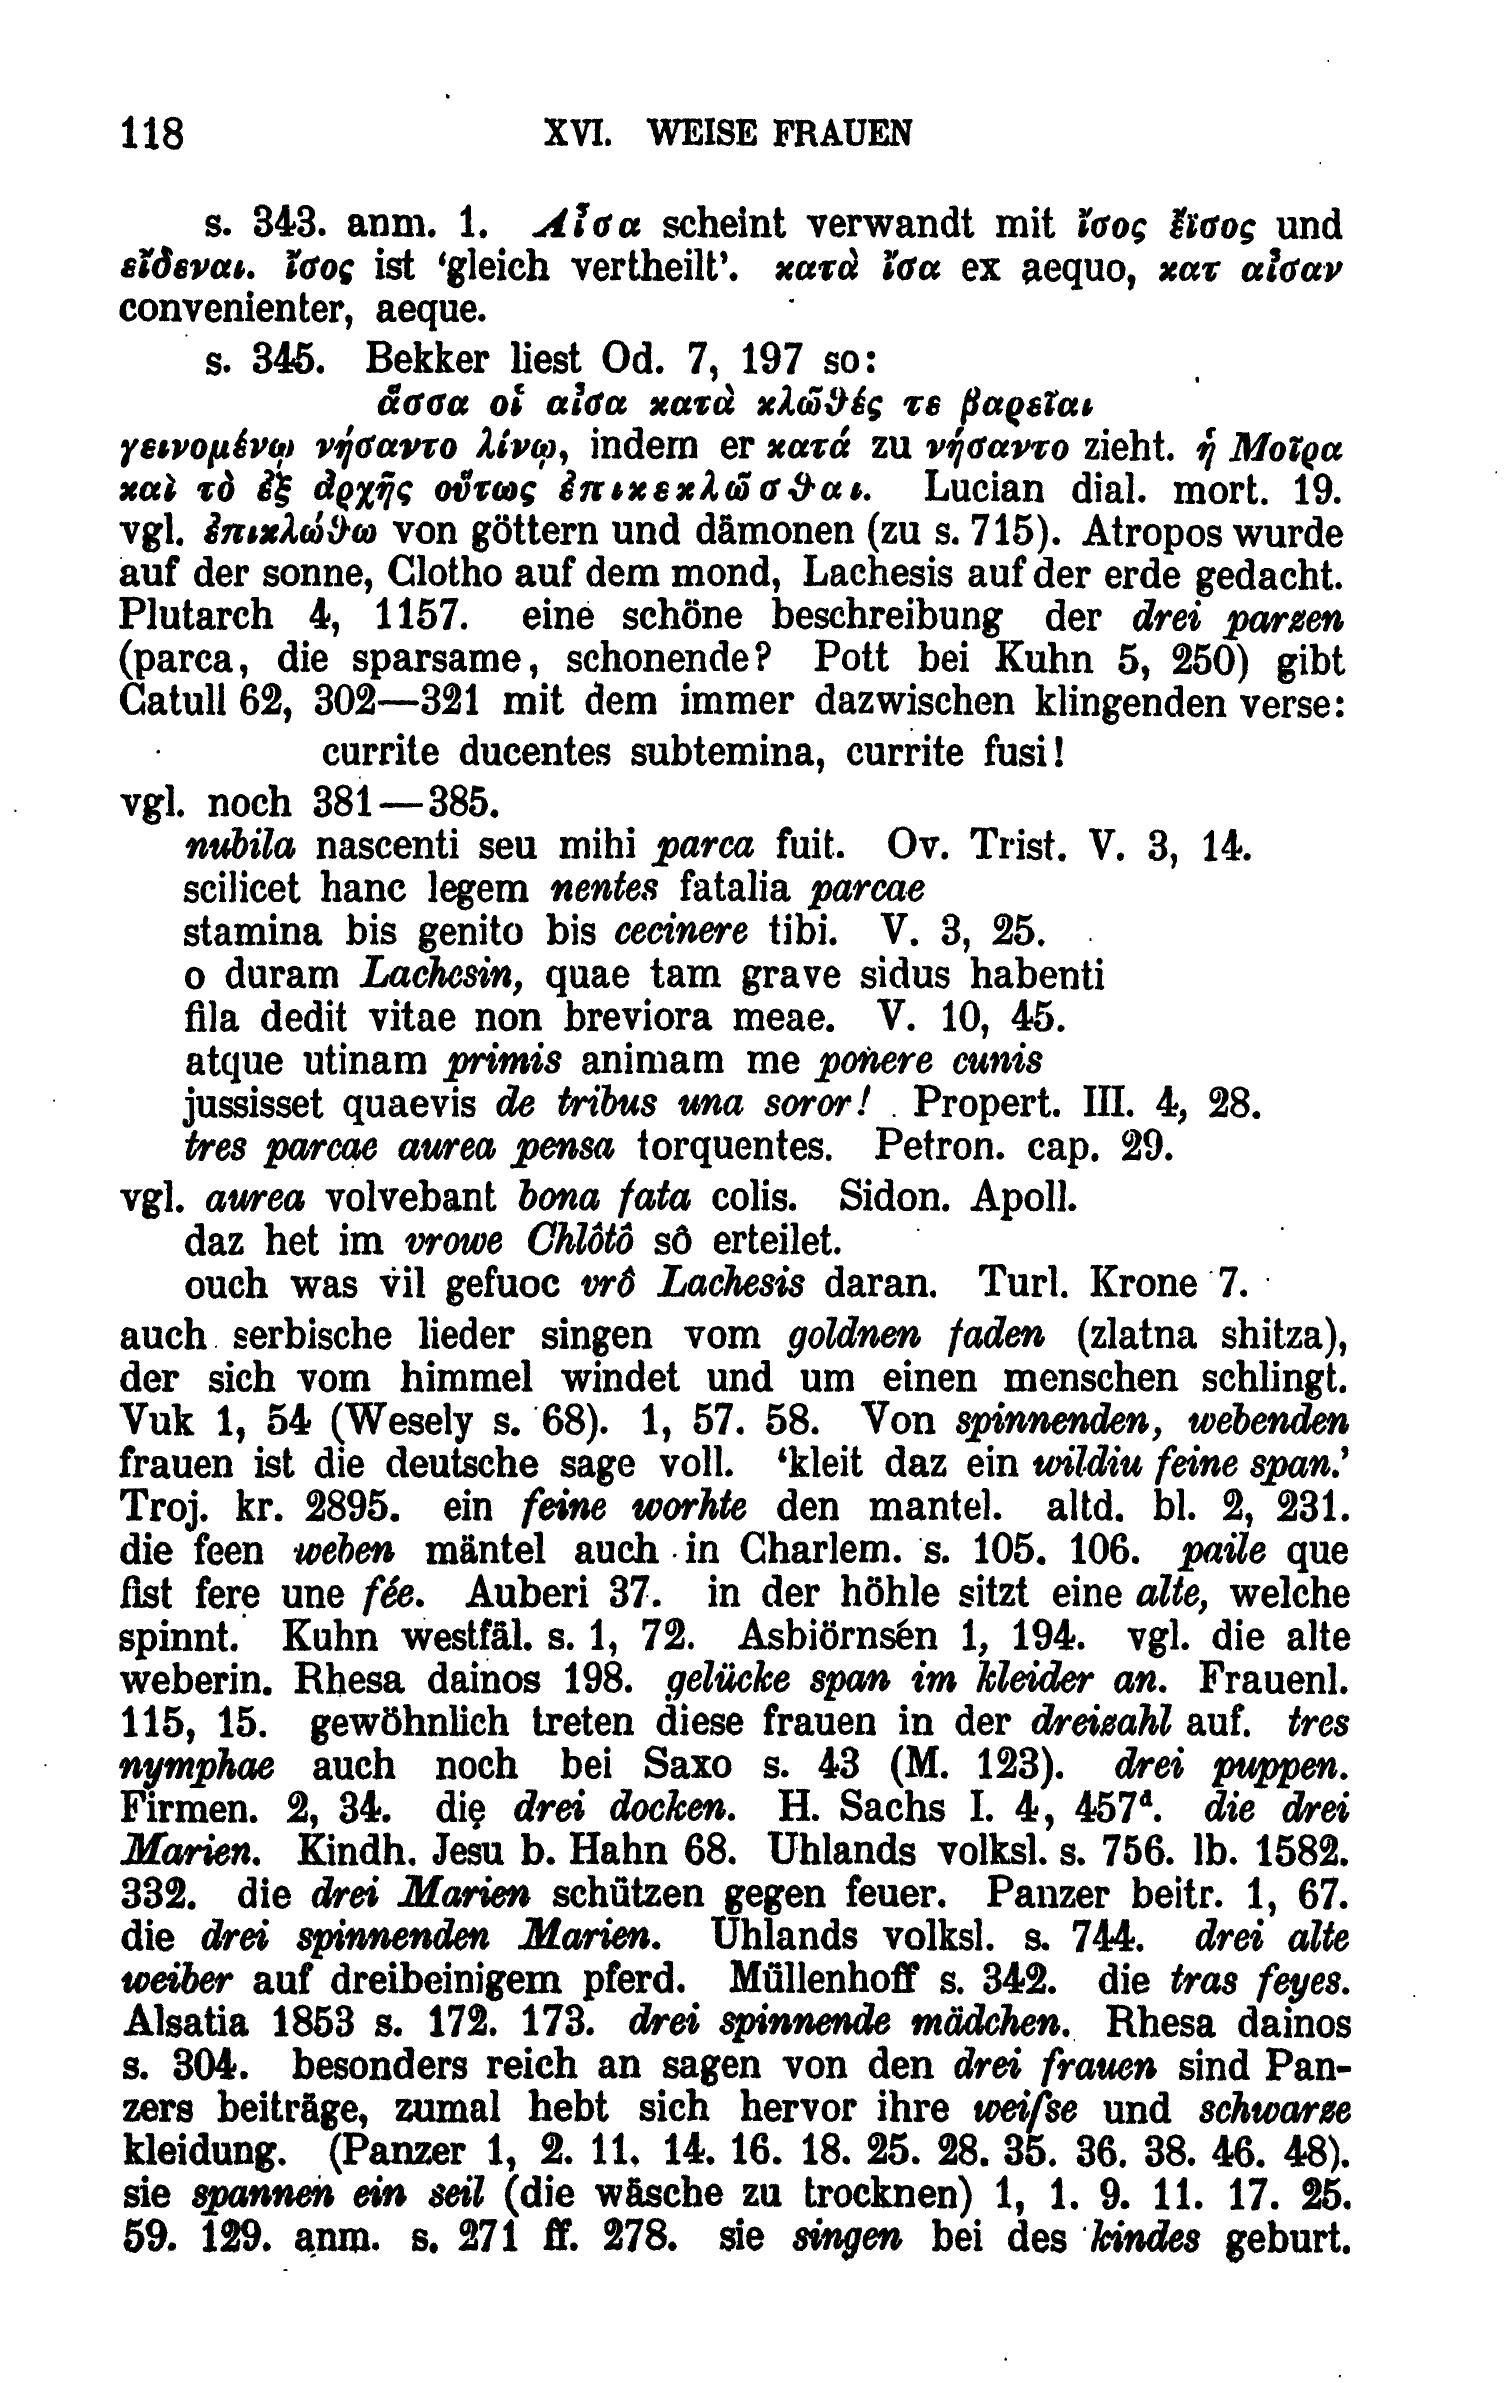 File:Deutsche Mythologie (Grimm) V3 132.jpg - Wikimedia Commons